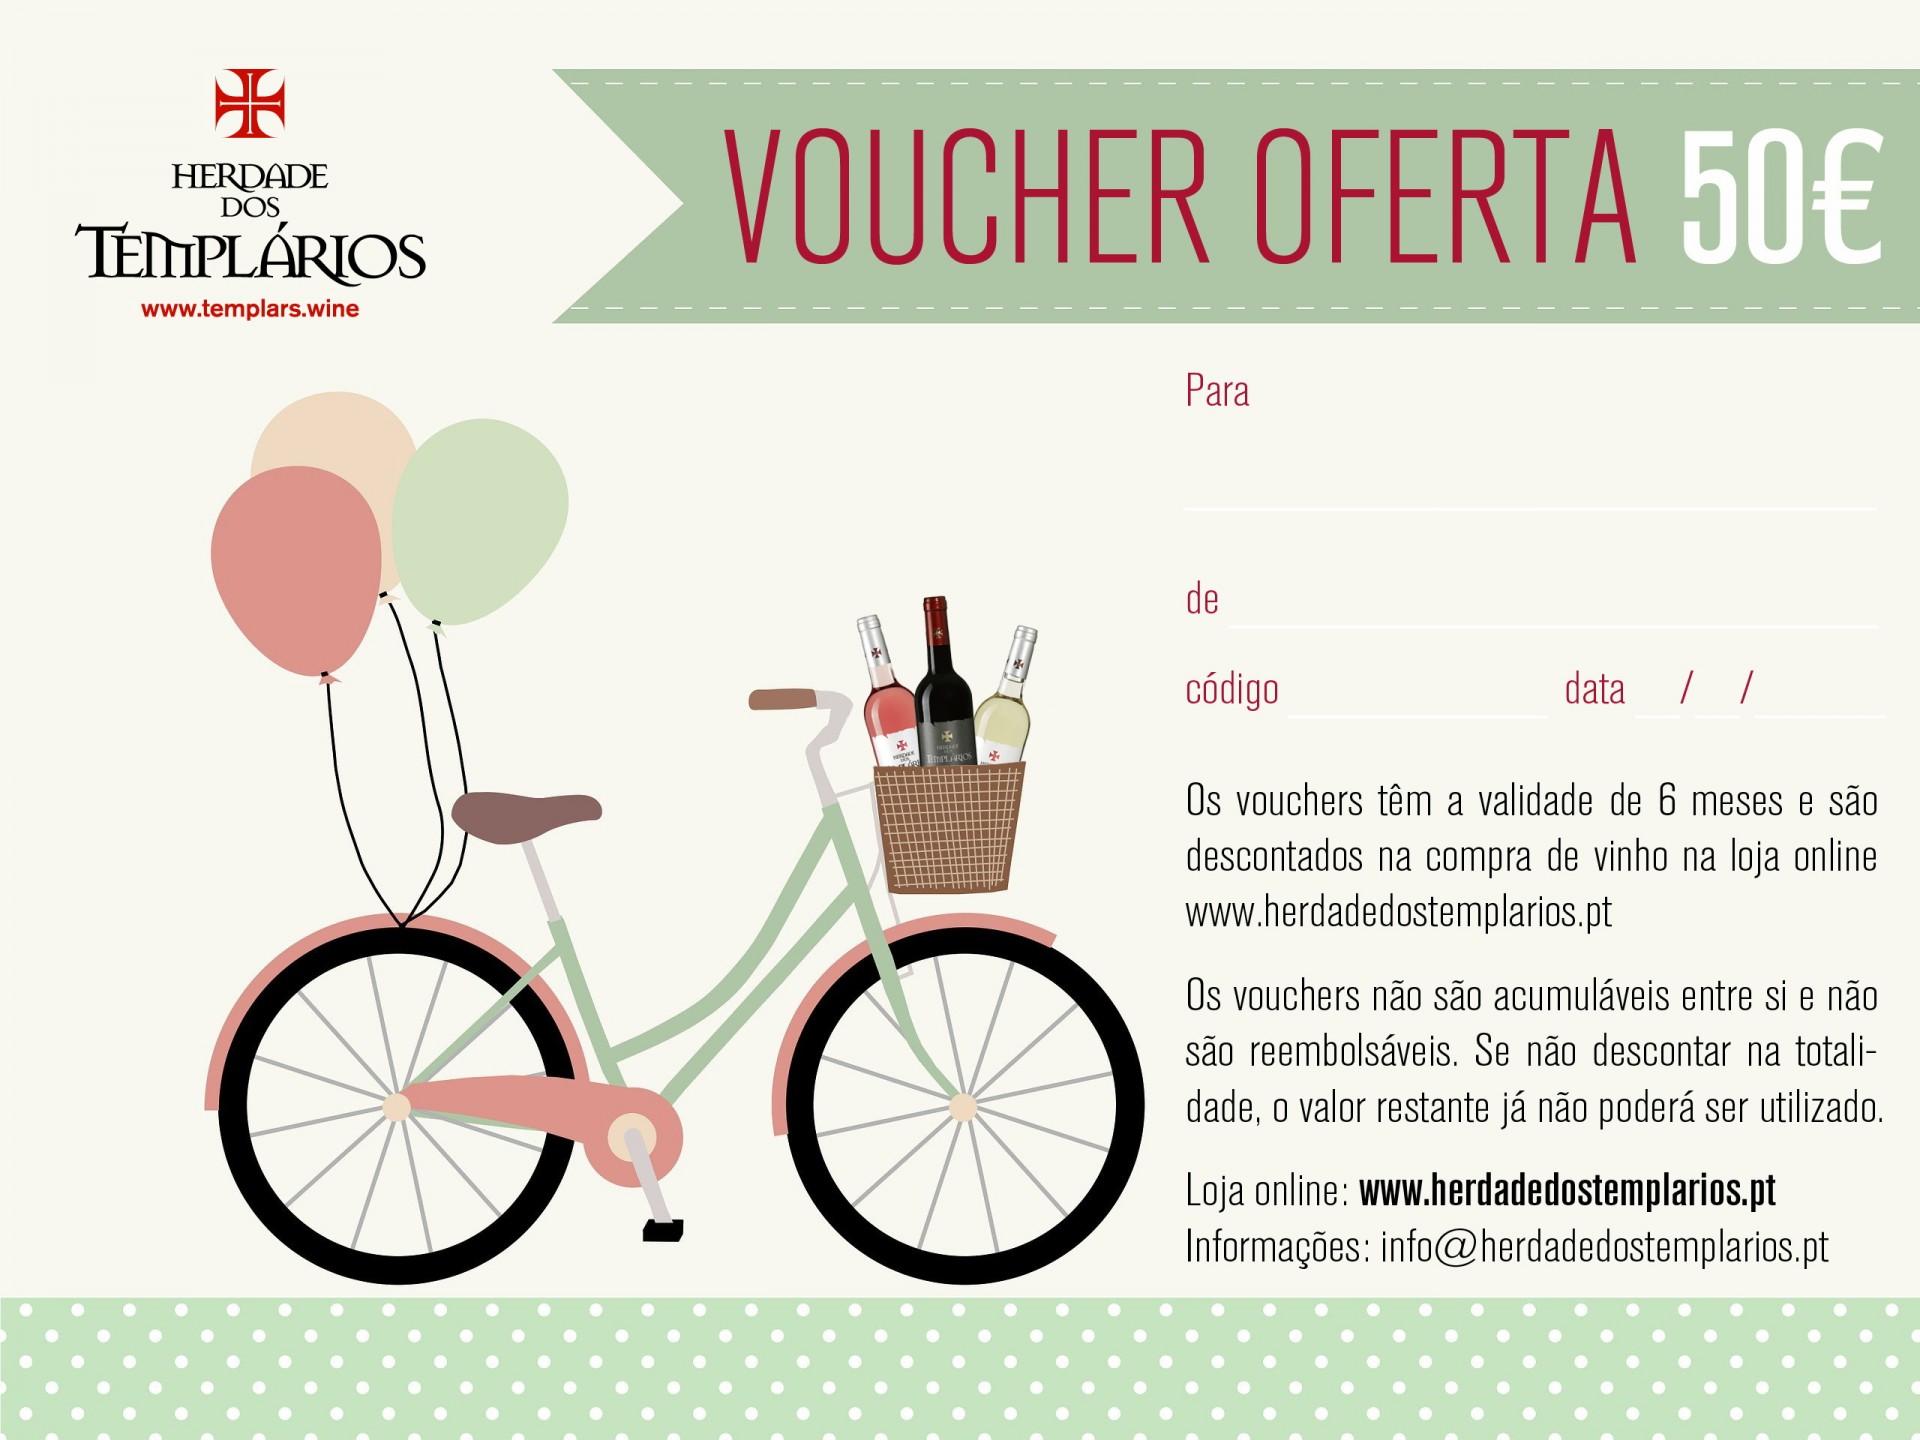 Voucher de Oferta - 50€